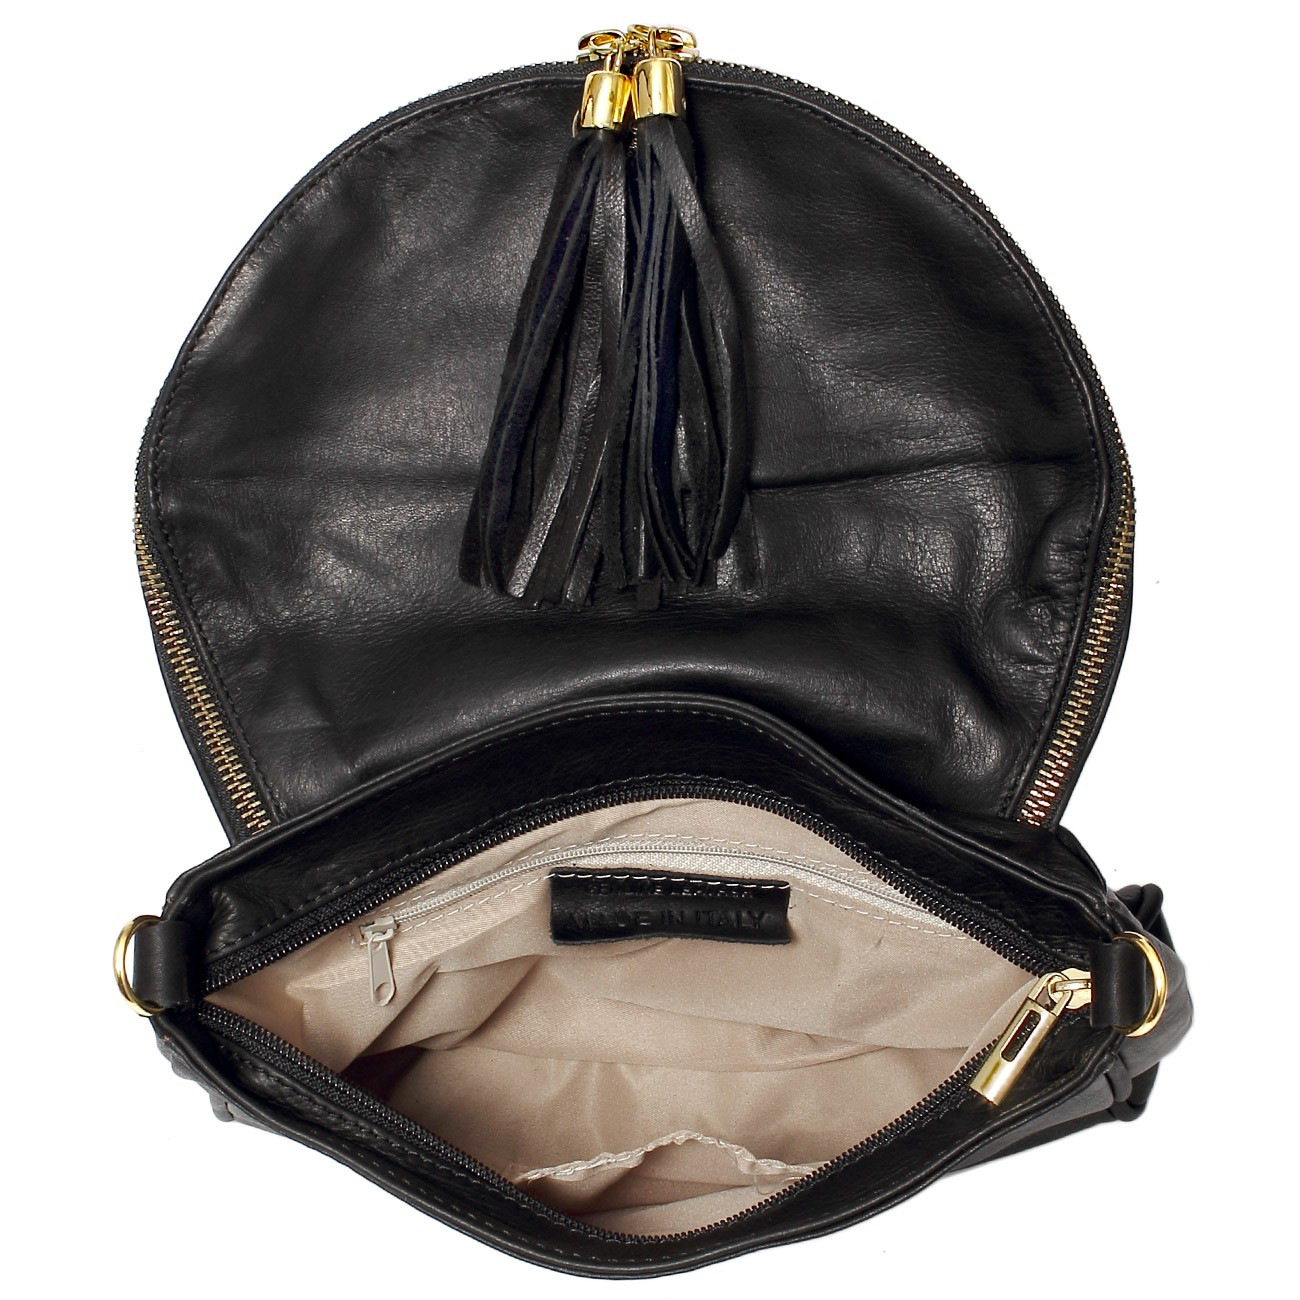 caspar damen tasche handtasche umh ngetasche leder weich. Black Bedroom Furniture Sets. Home Design Ideas